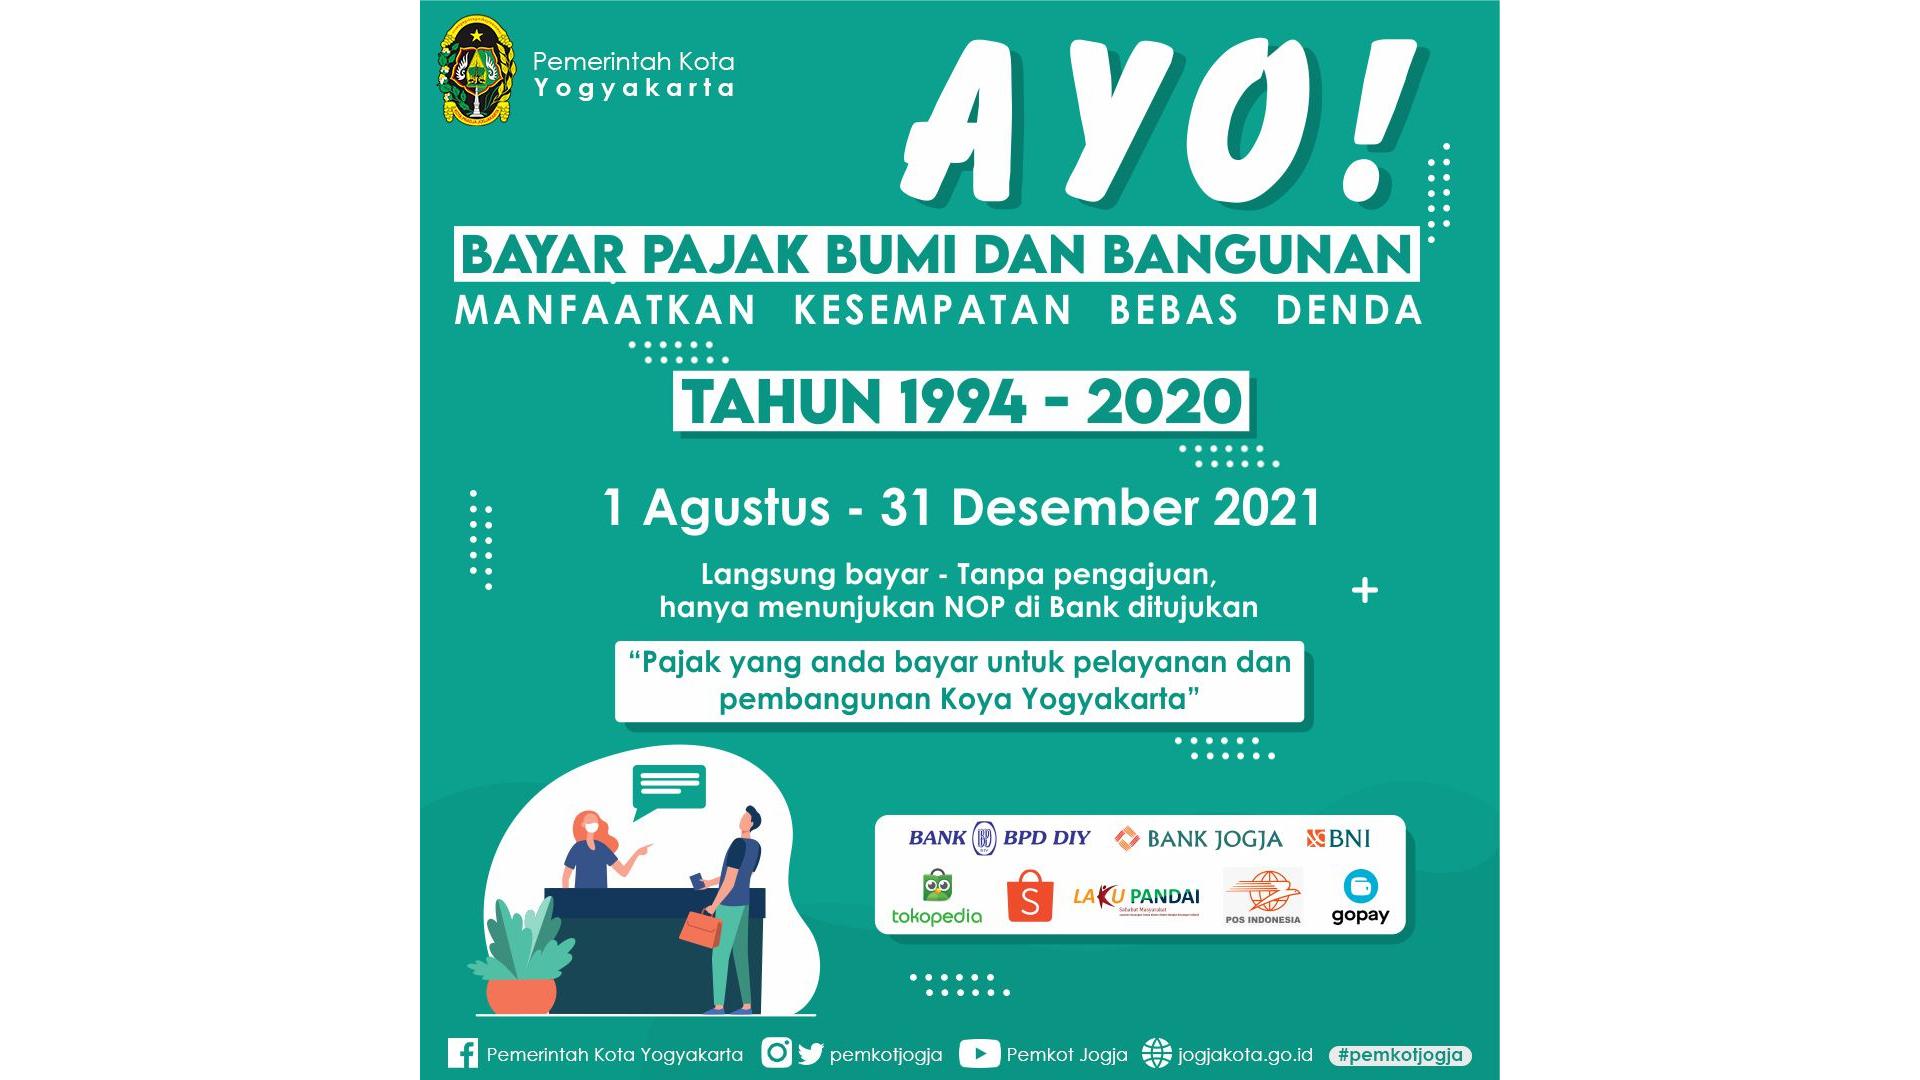 Penghapusan Sanksi Administratif Berupa Denda Atas Tunggakan Pajak Bumi dan Bangunan Perdesaan dan Perkotaan di Kota Yogyakarta